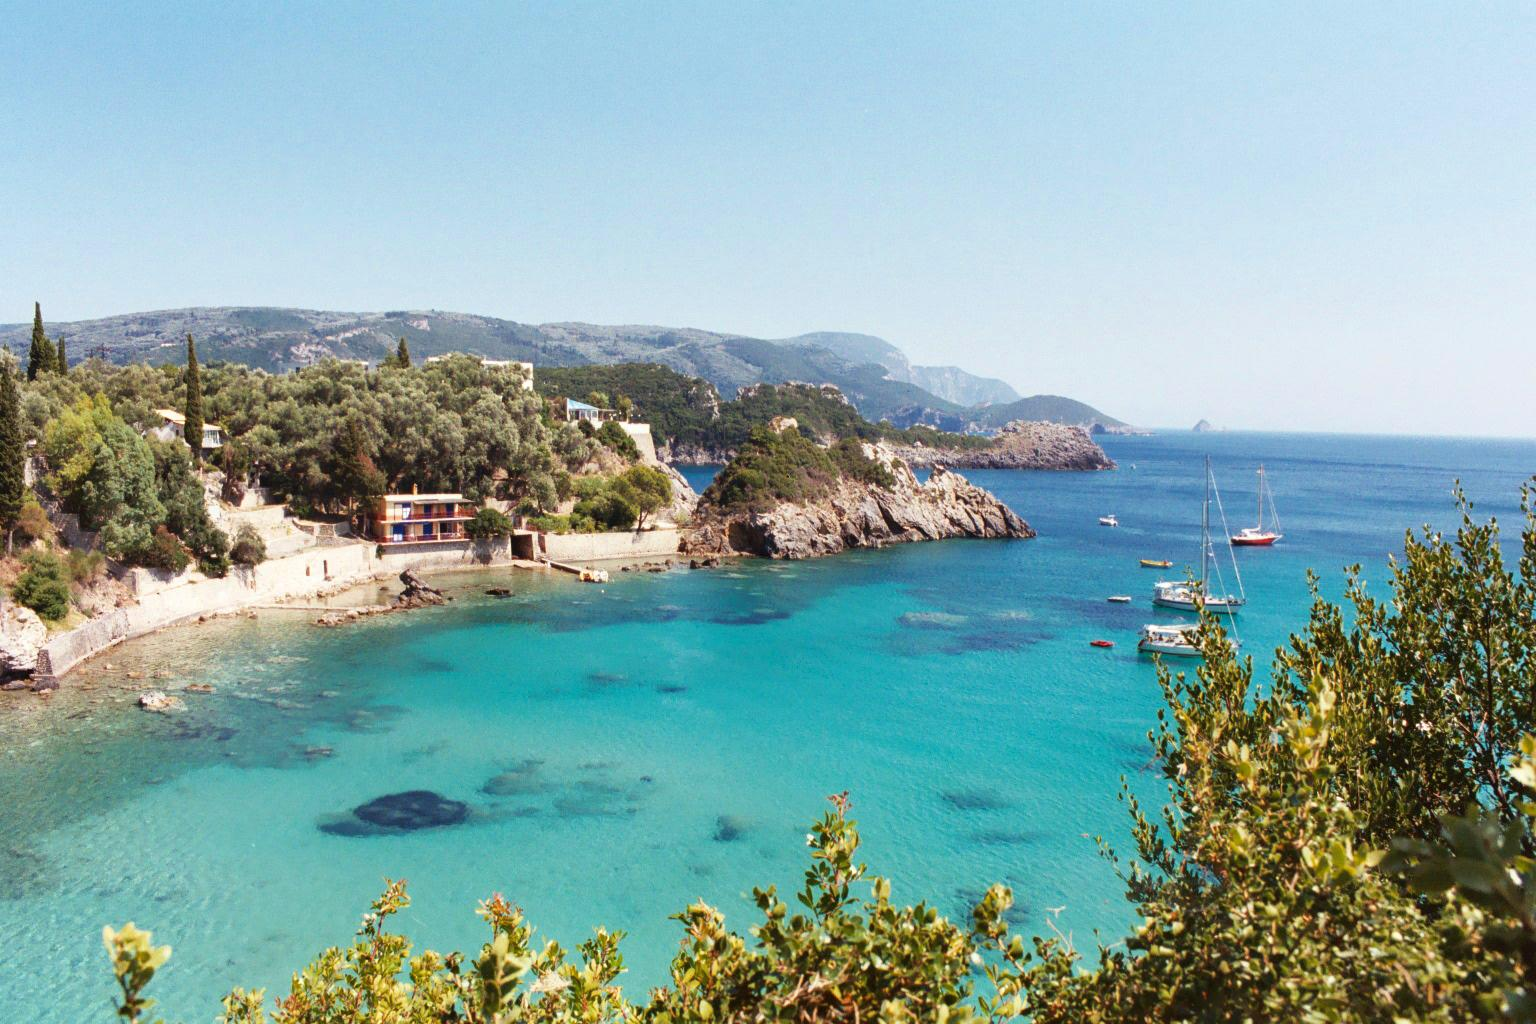 Corfu Island off the coast of Greece